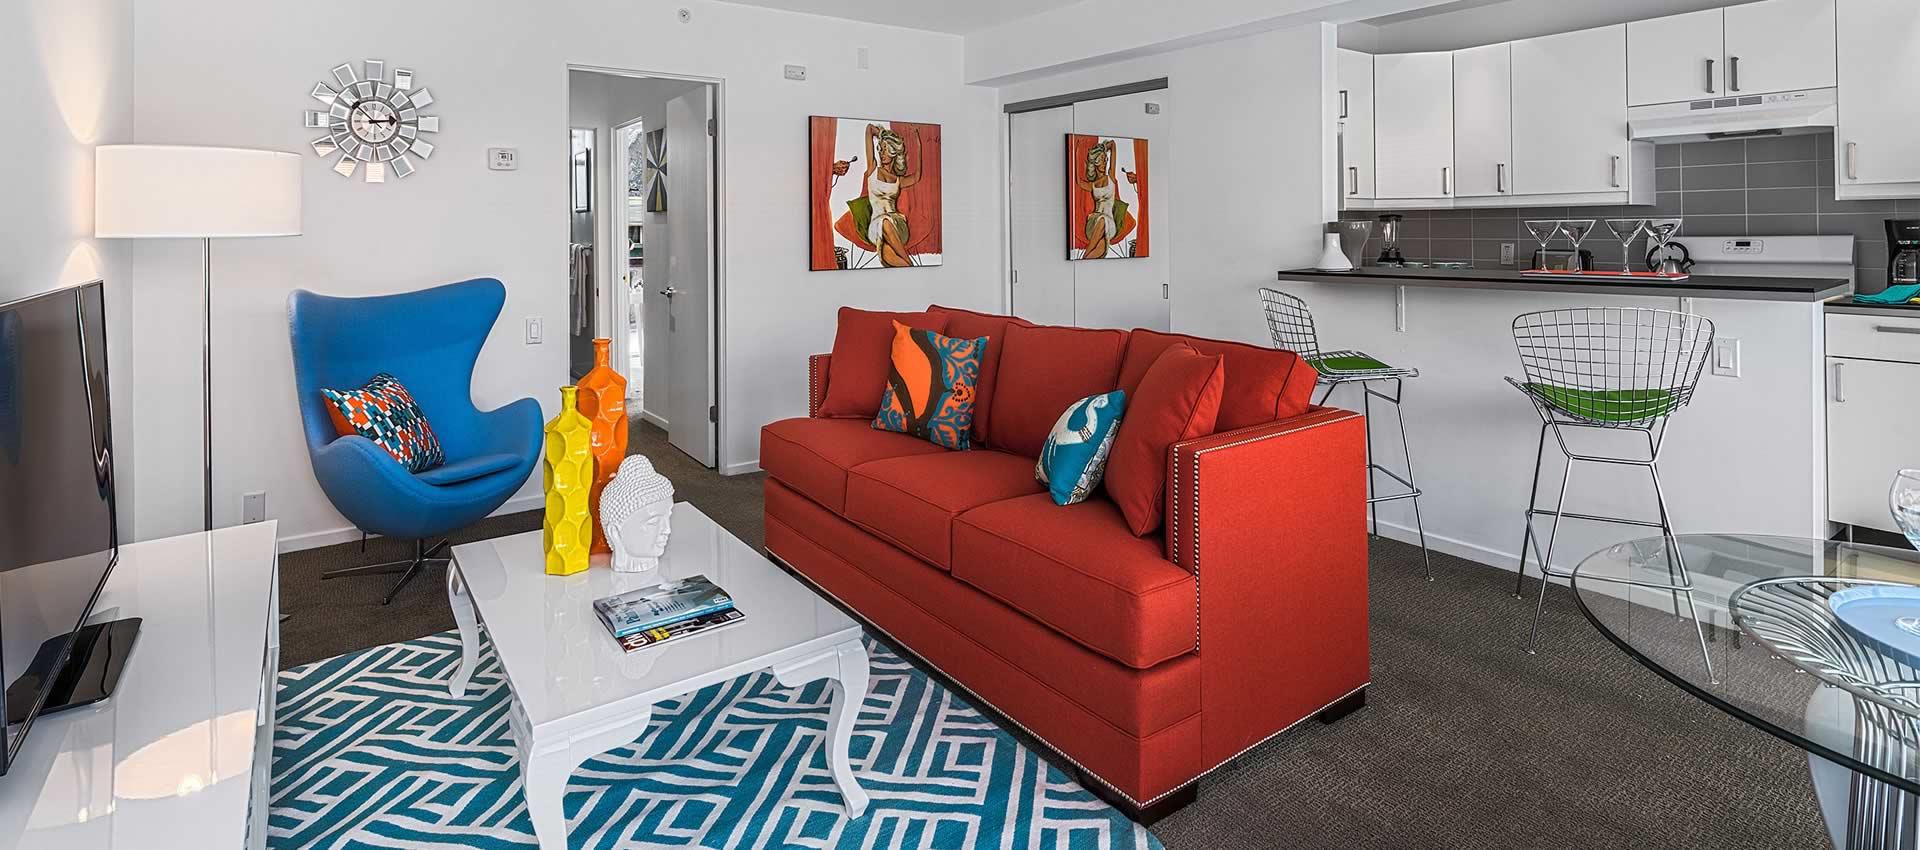 twist hotel room 221 ivingroom and kitchen